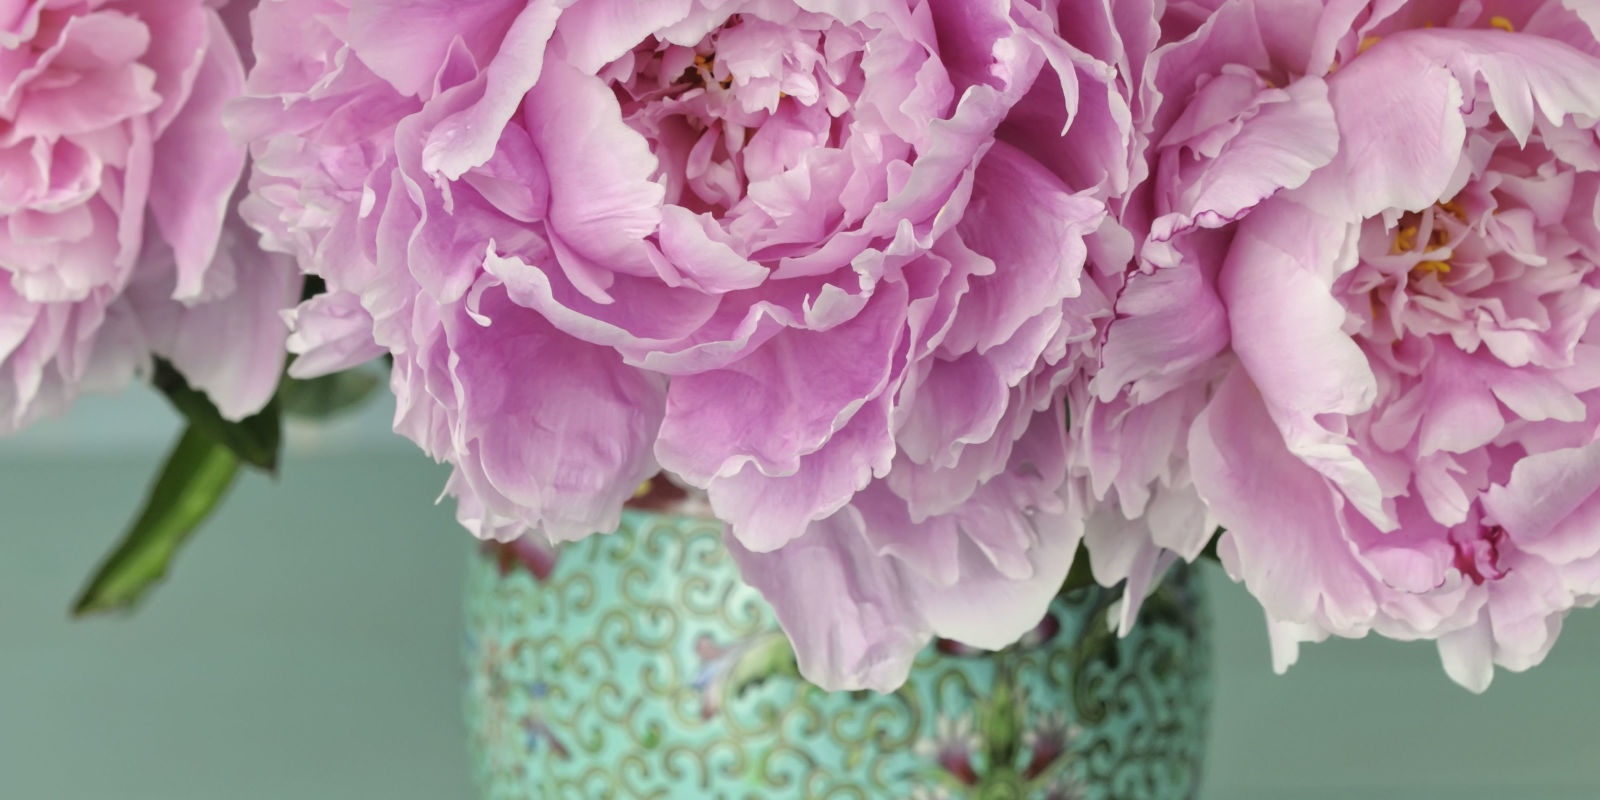 Homemade Flower Food Diy Floral Preservative Recipe